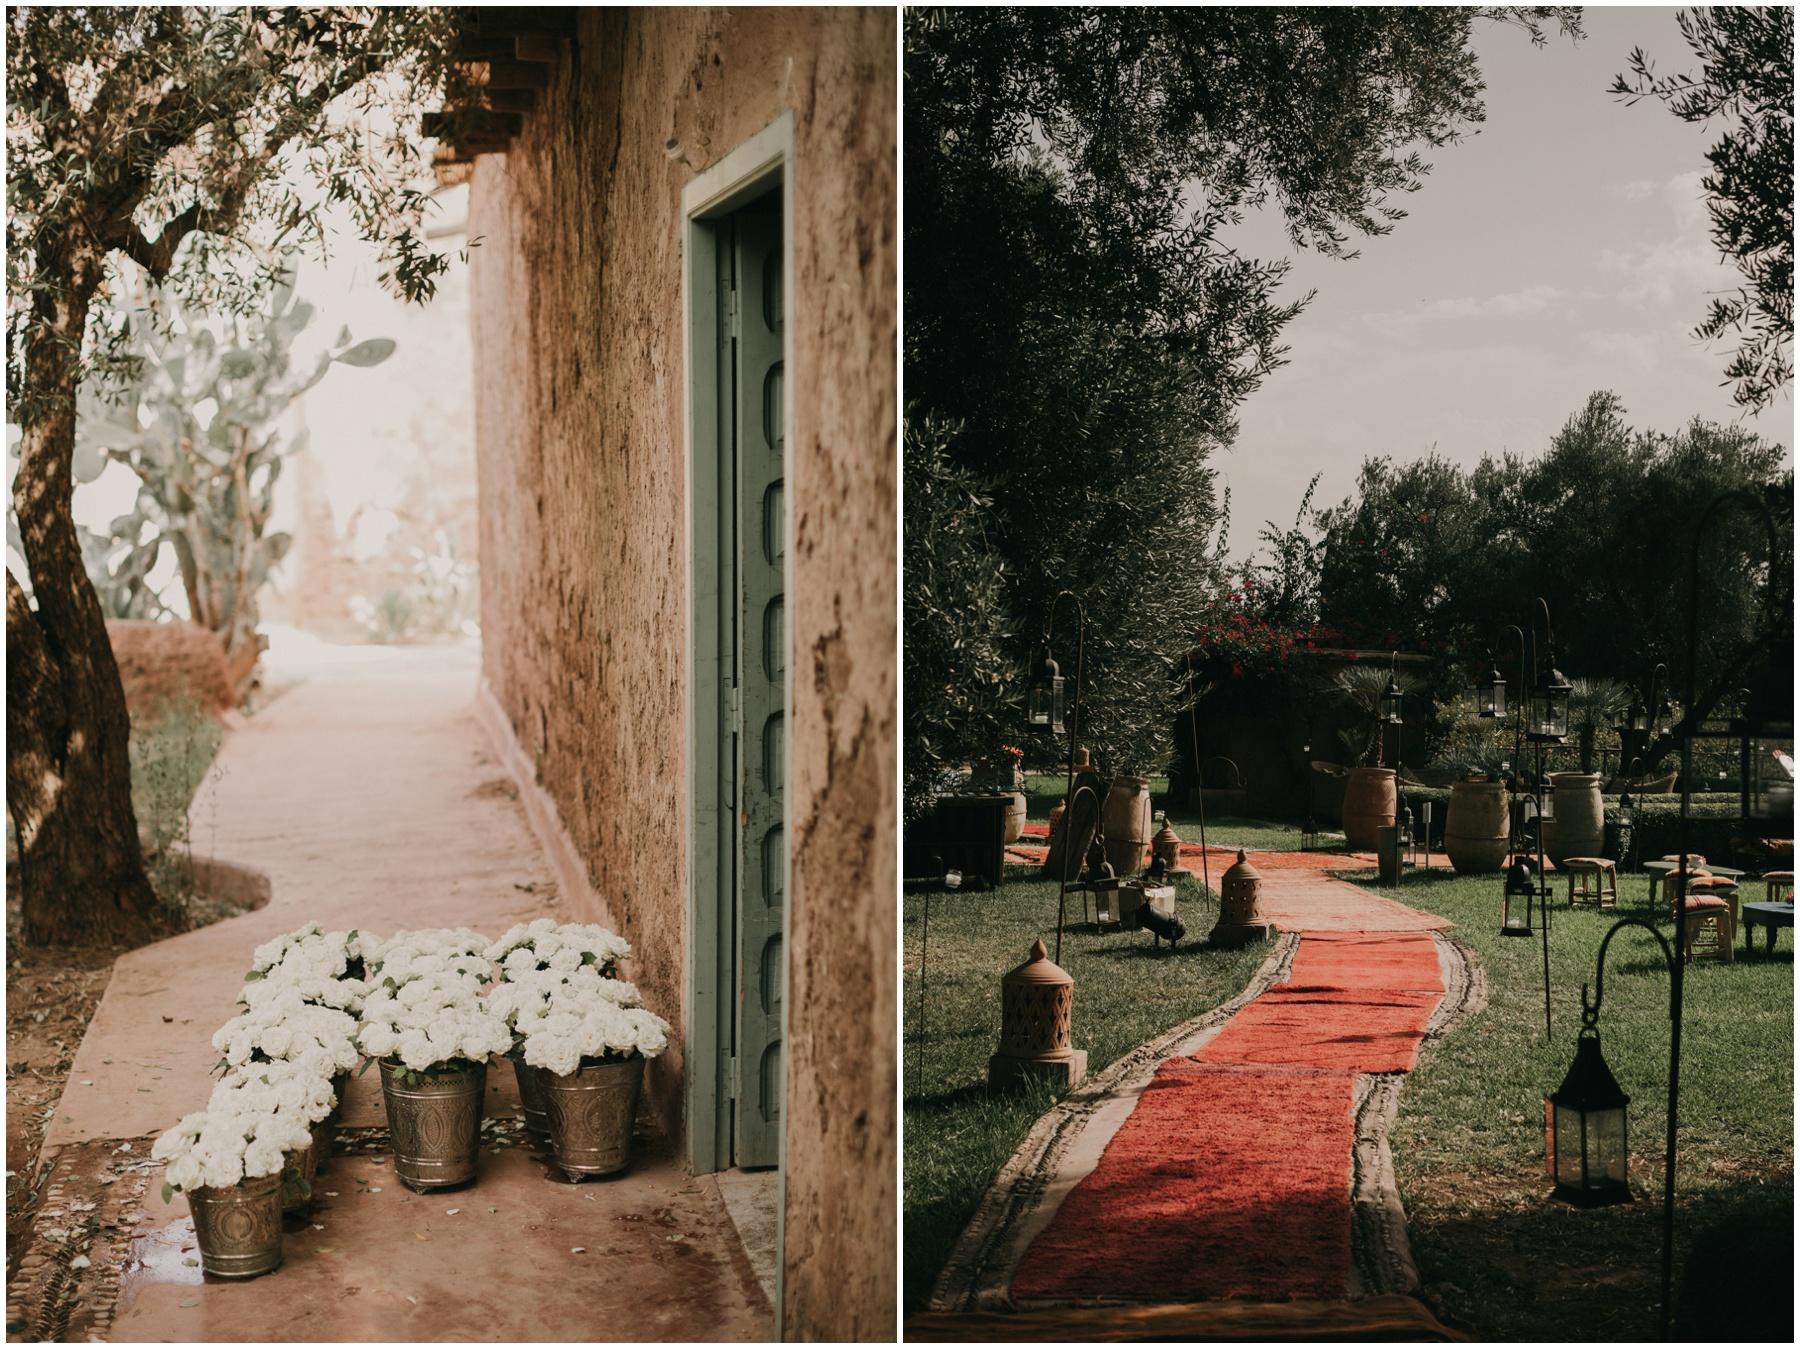 Marrakech Wedding Beldi Coutry Club 005.JPG